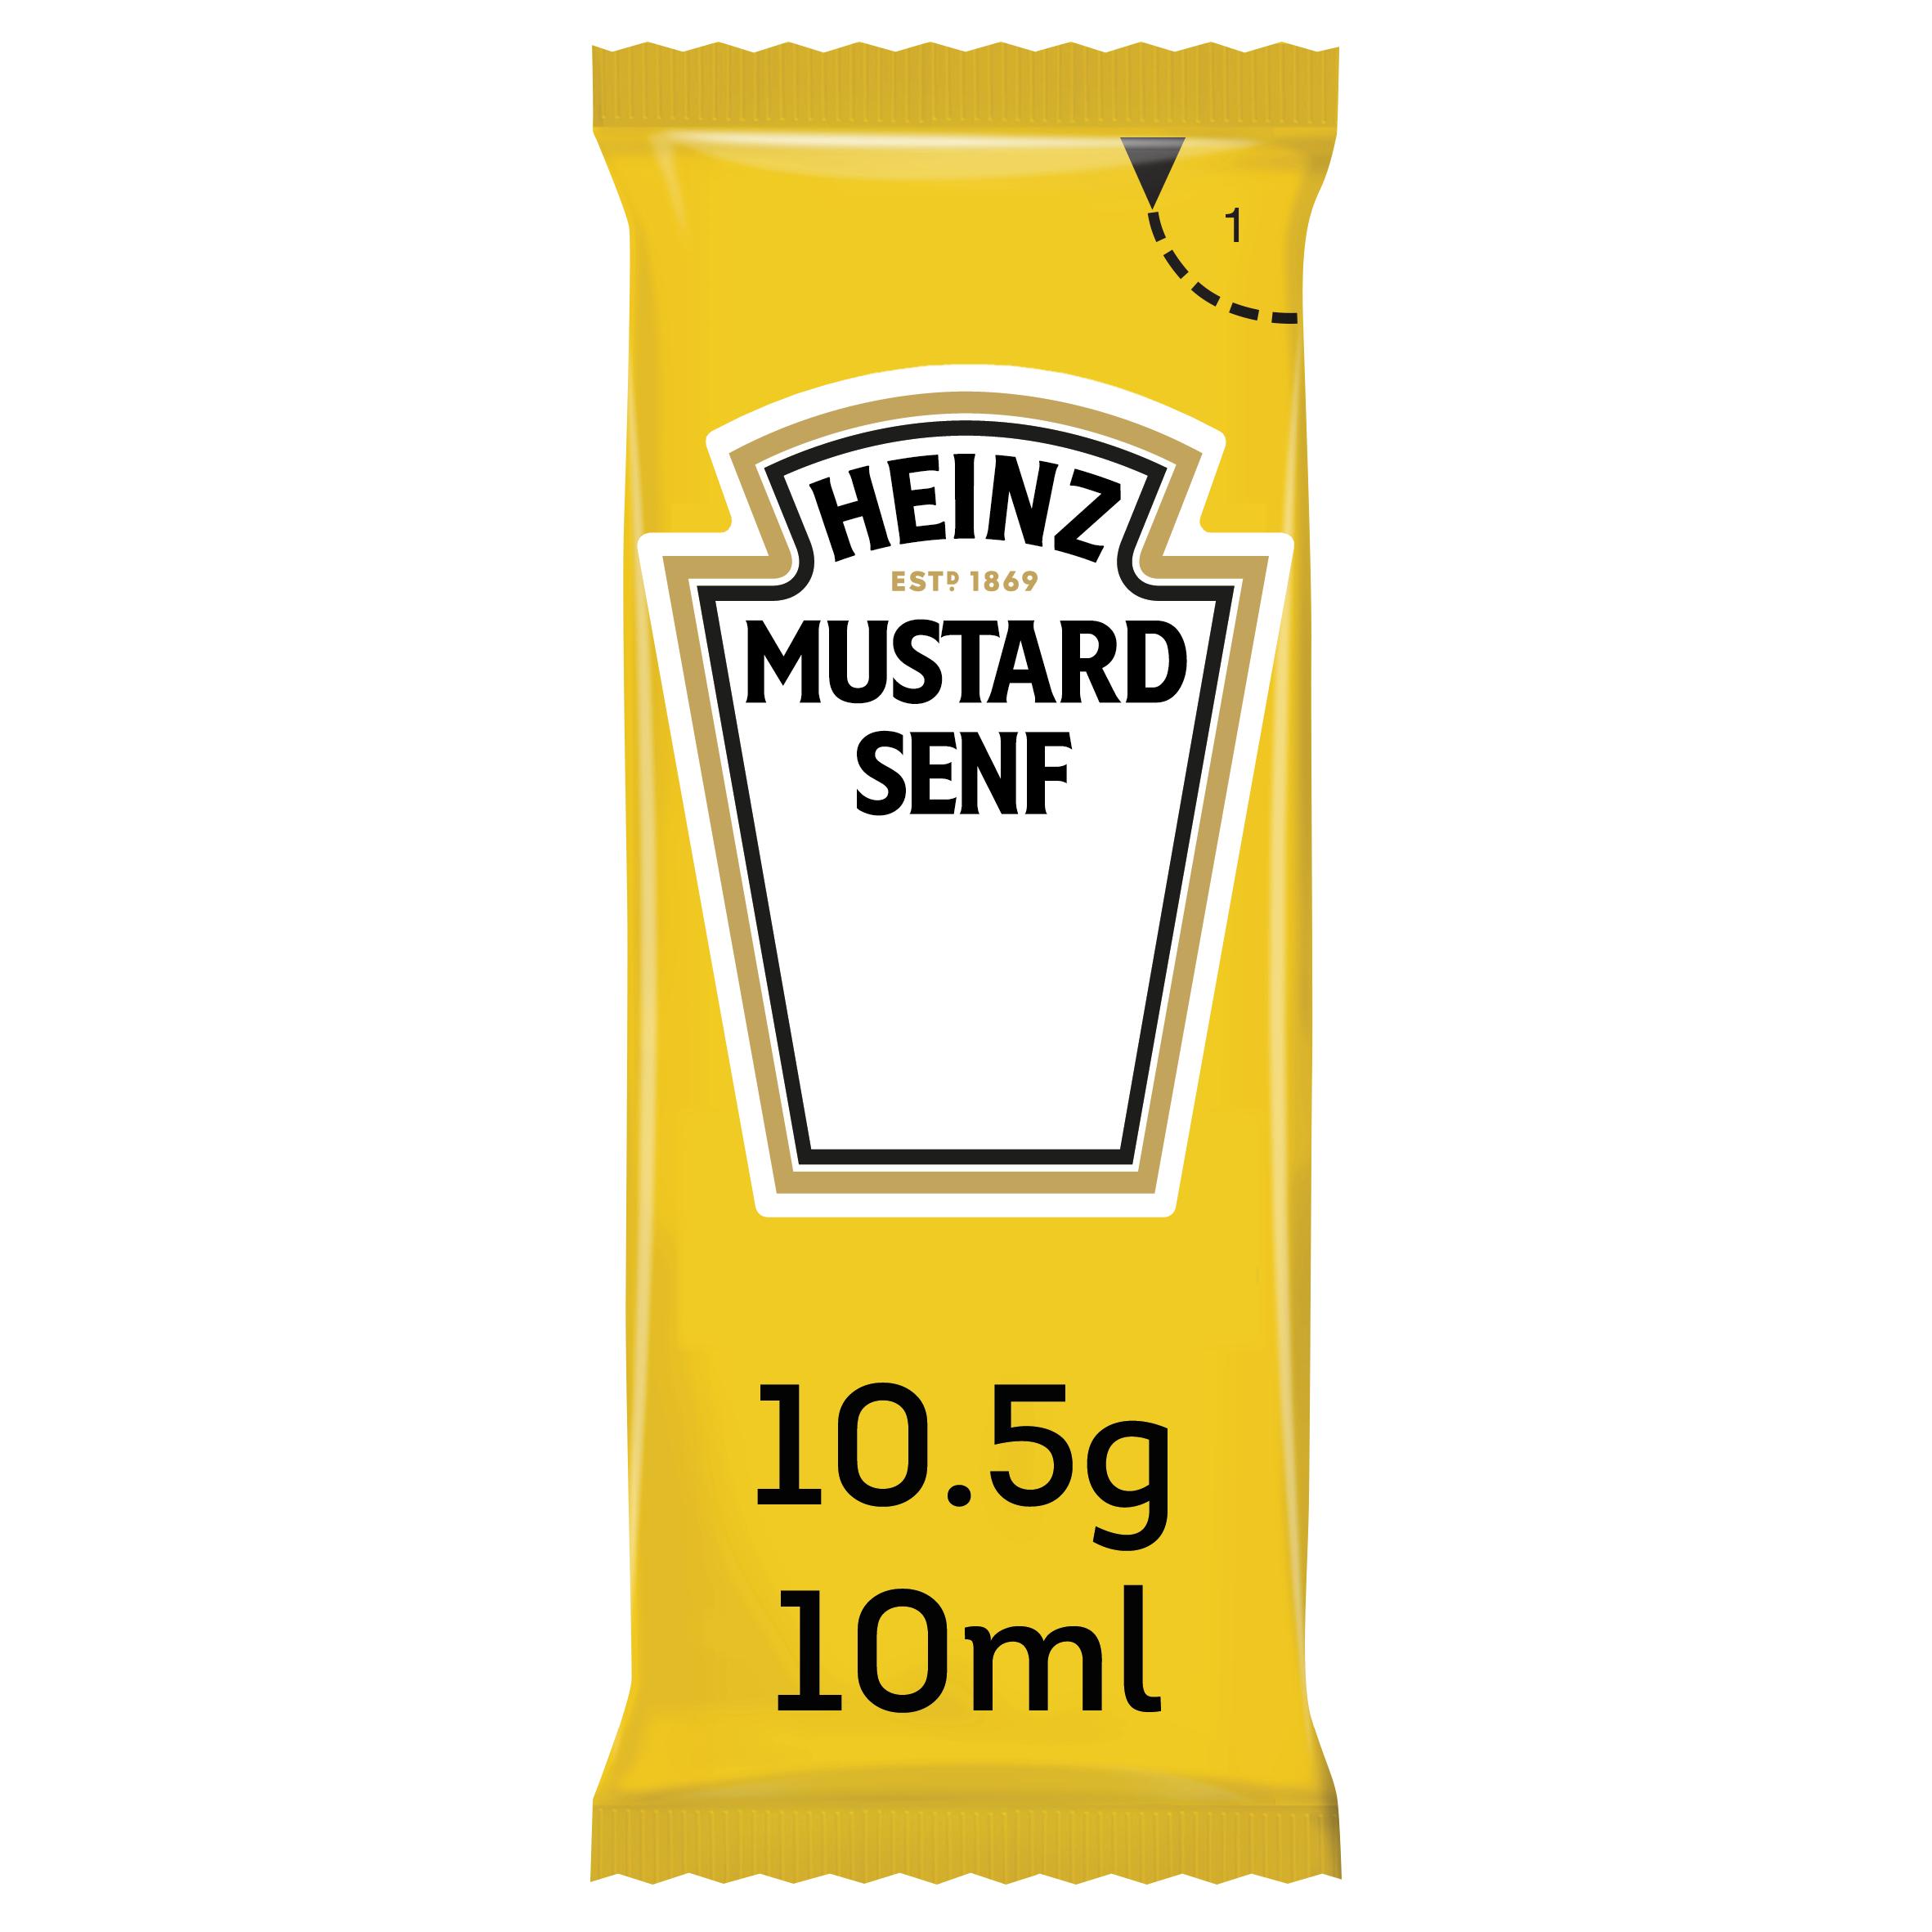 Heinz Mustard 10ml Sachet image